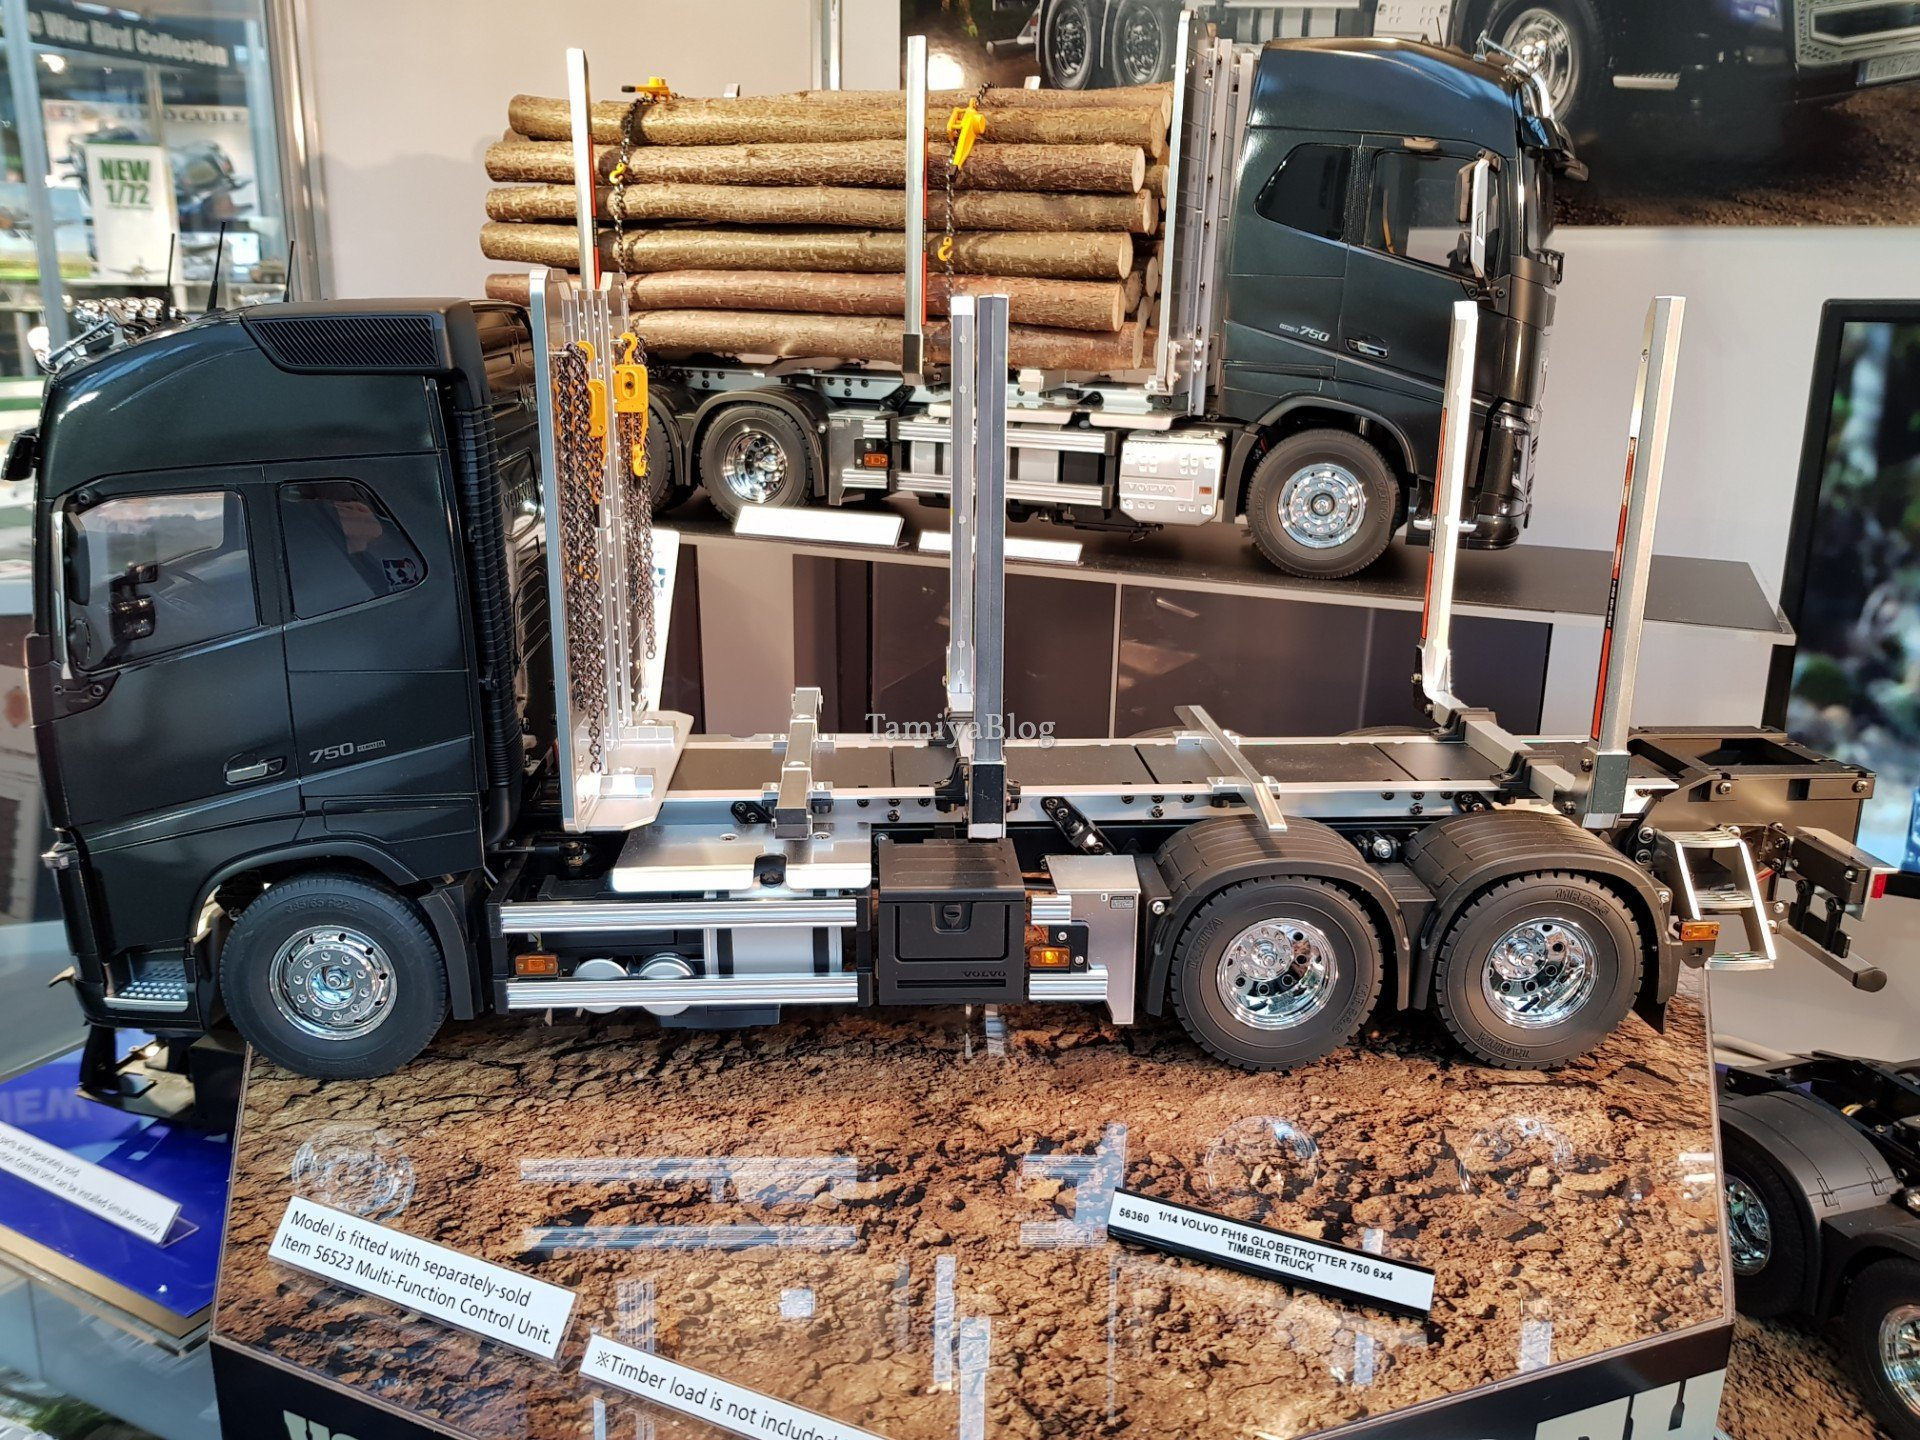 Nuevo camion de TAMIYA Volvo FH16 Globetrotter 750 6x4 Timber 20190130_100339_tamiyablognuremberg8054979462260435796